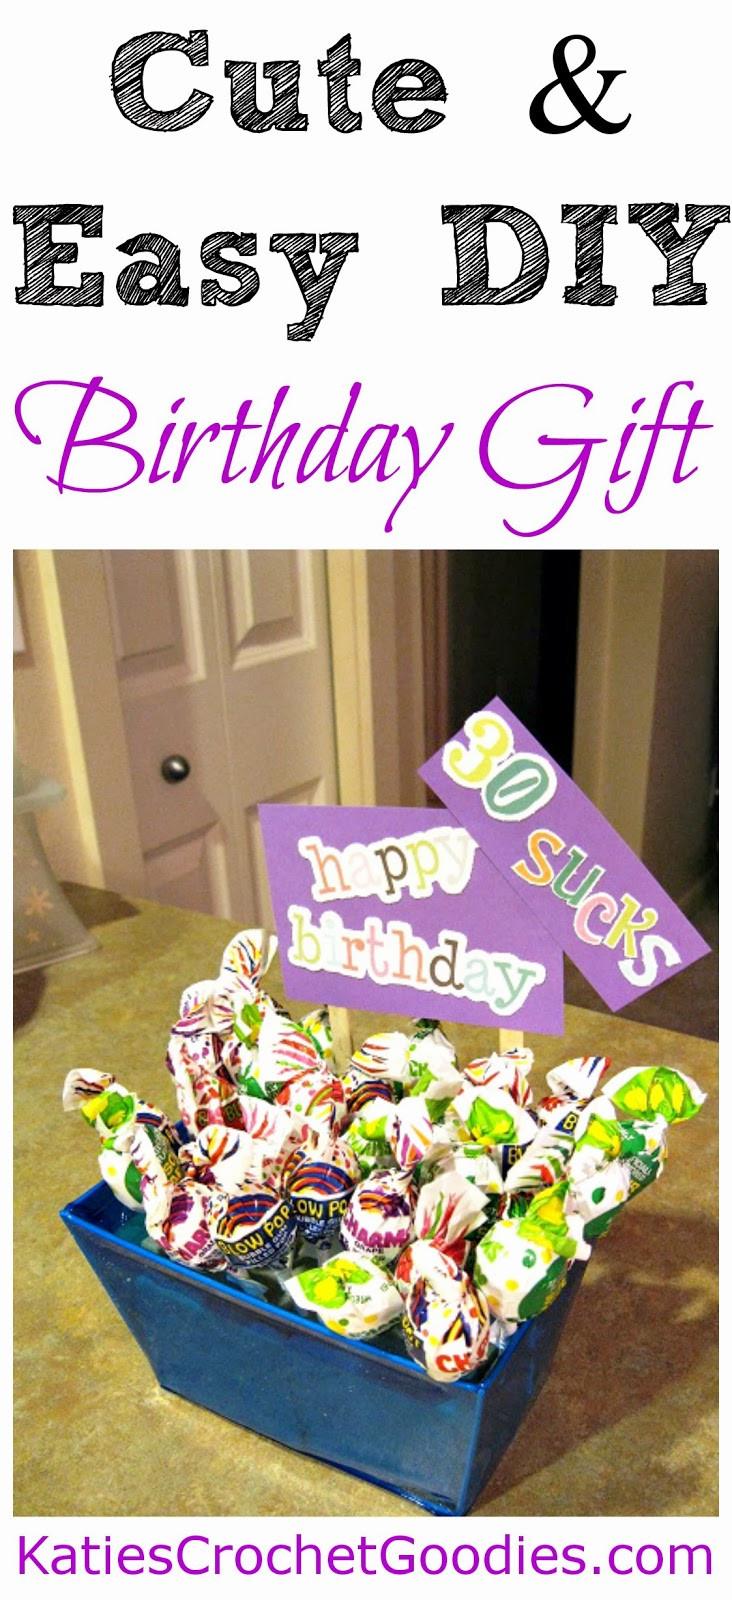 Easy Birthday Gift Ideas  Funny Sucker Birthday Gift Idea Katie s Crochet Goo s